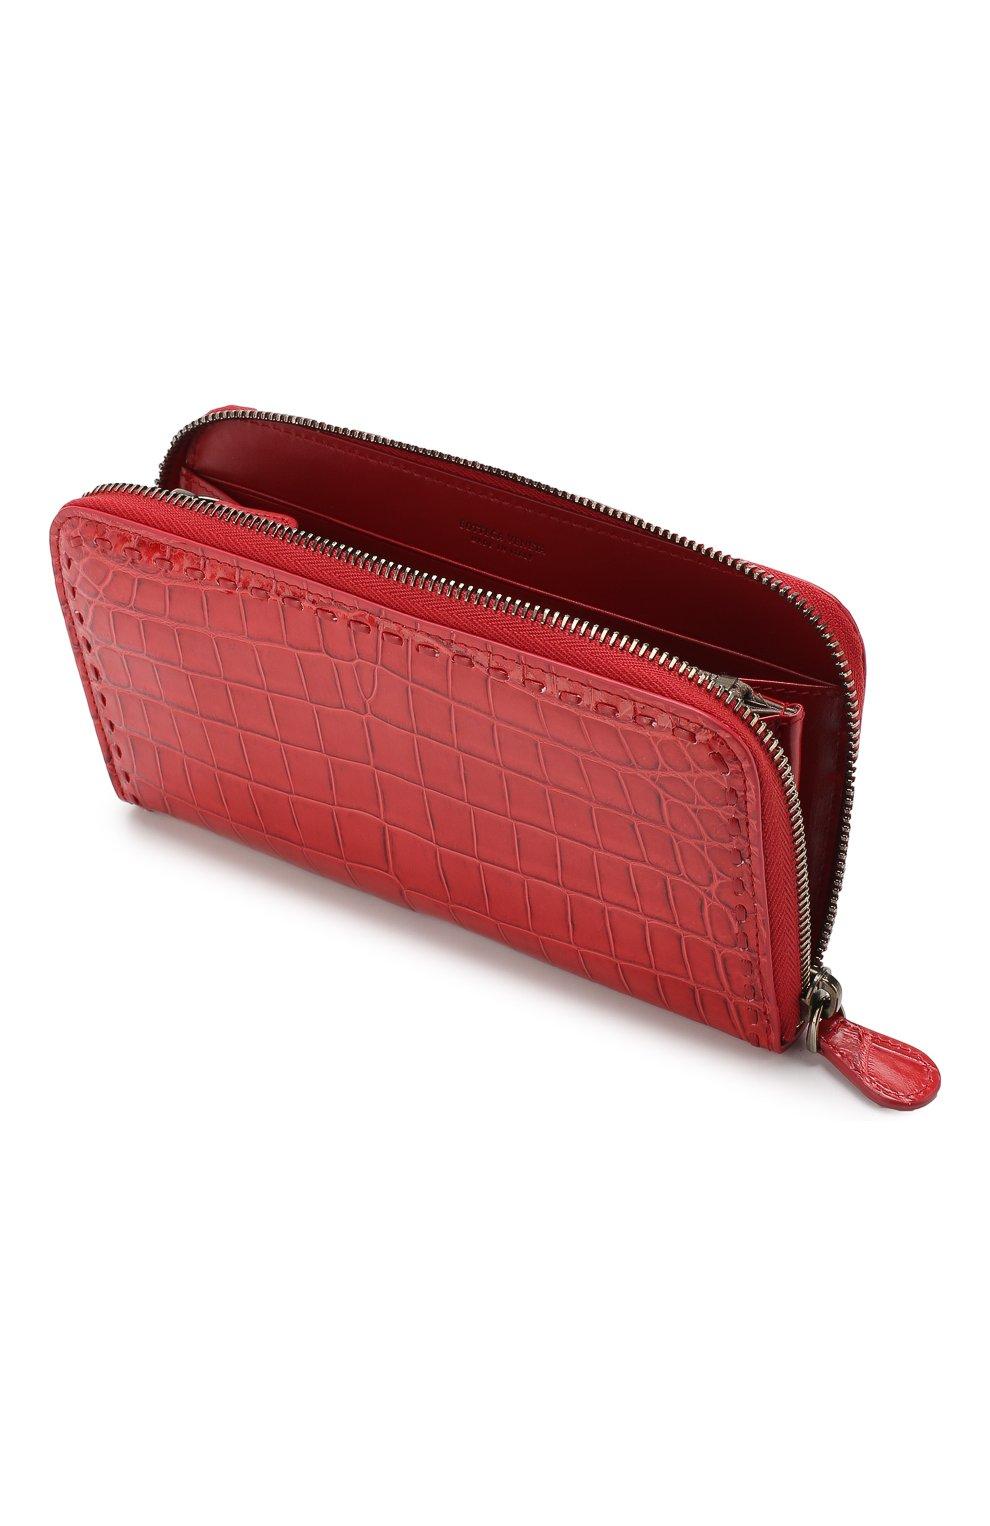 Кошелек из кожи крокодила на молнии Bottega Veneta красного цвета | Фото №3